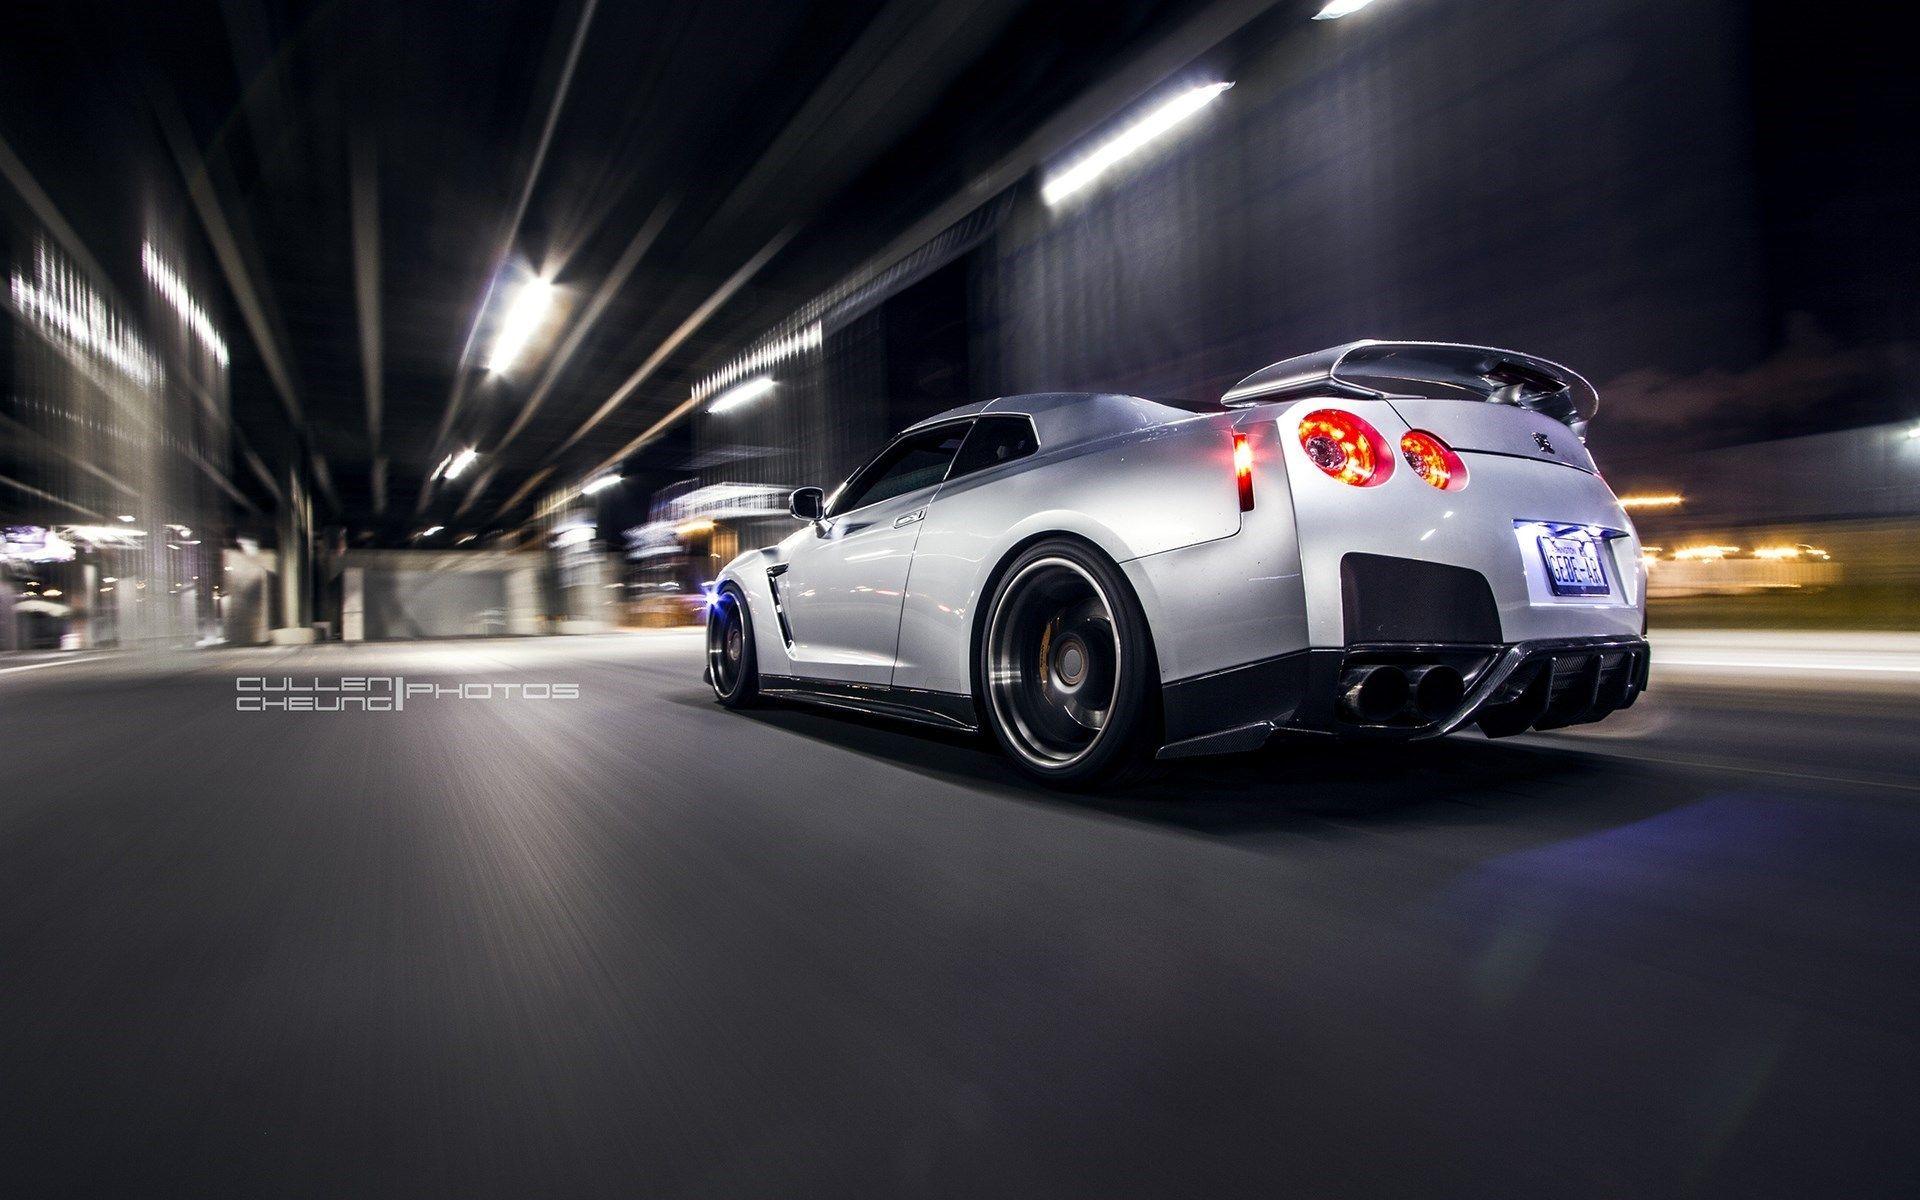 Nissan nissan deportivos nissan gt r nissan gt r r35 tuning cars - Nissan Gtr Hd Wallpapers Backgrounds Wallpaper